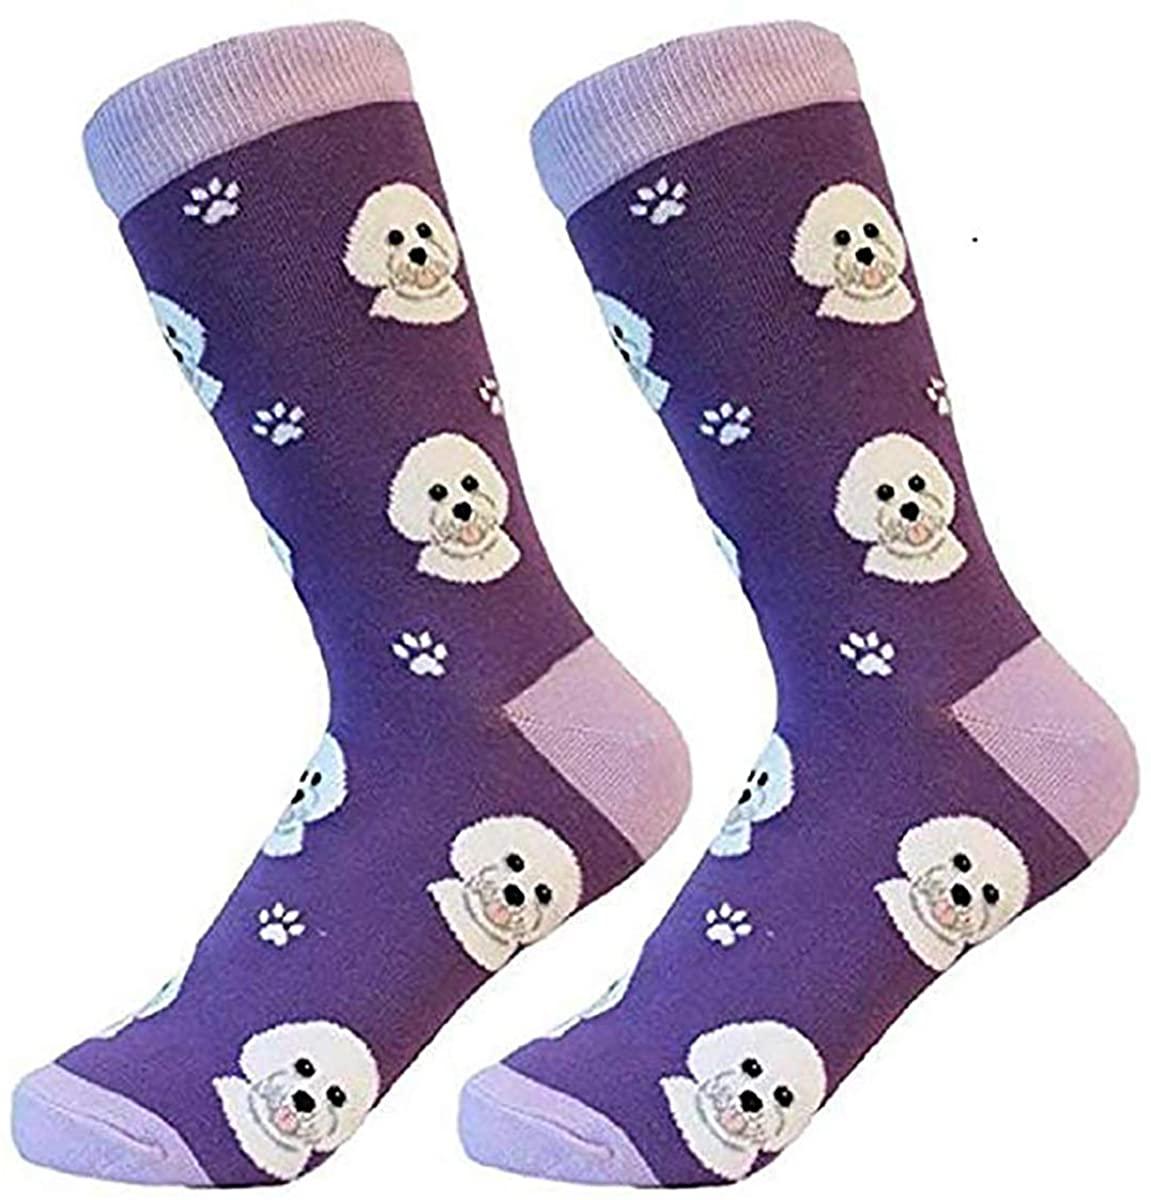 Bichon Frise Socks -200 Needle Count-Cotton Socks- Life Like Detail of Bichon- Unisex, One Size Fits Most